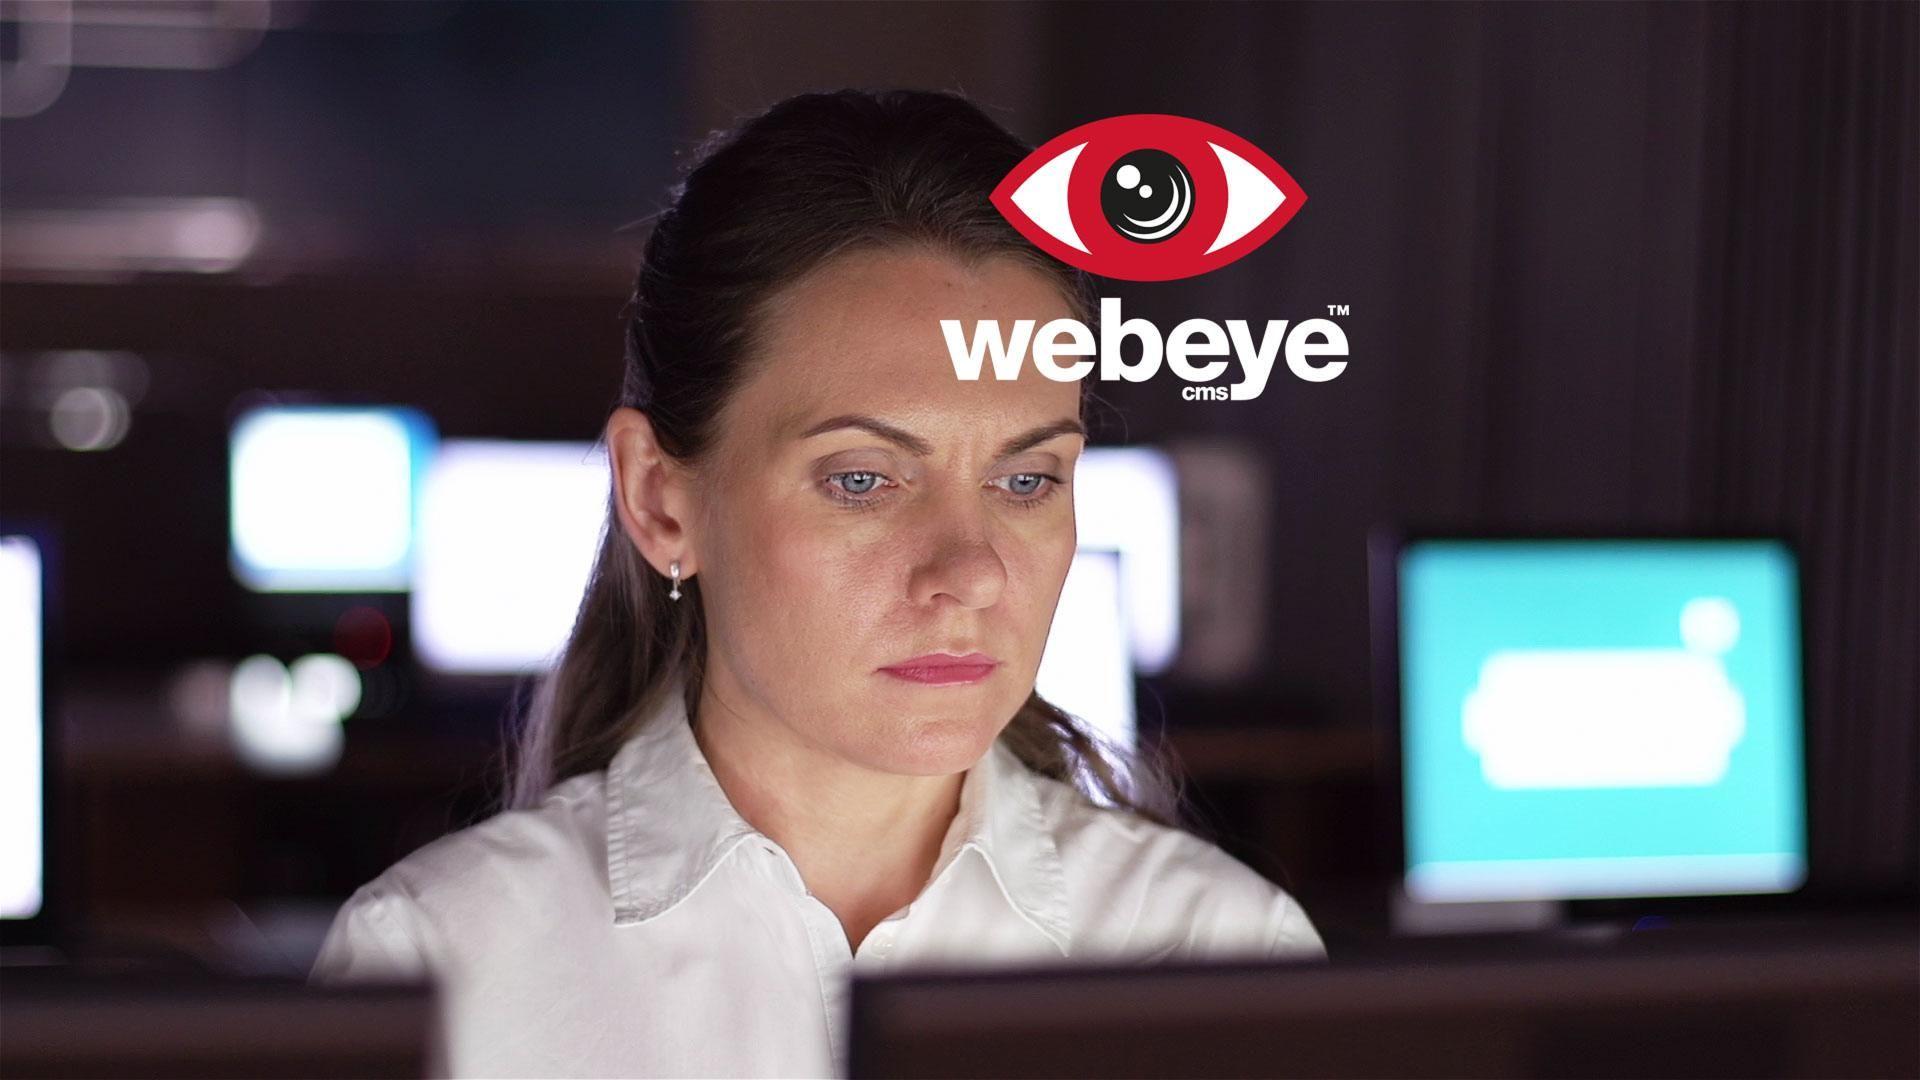 The Webeye concept